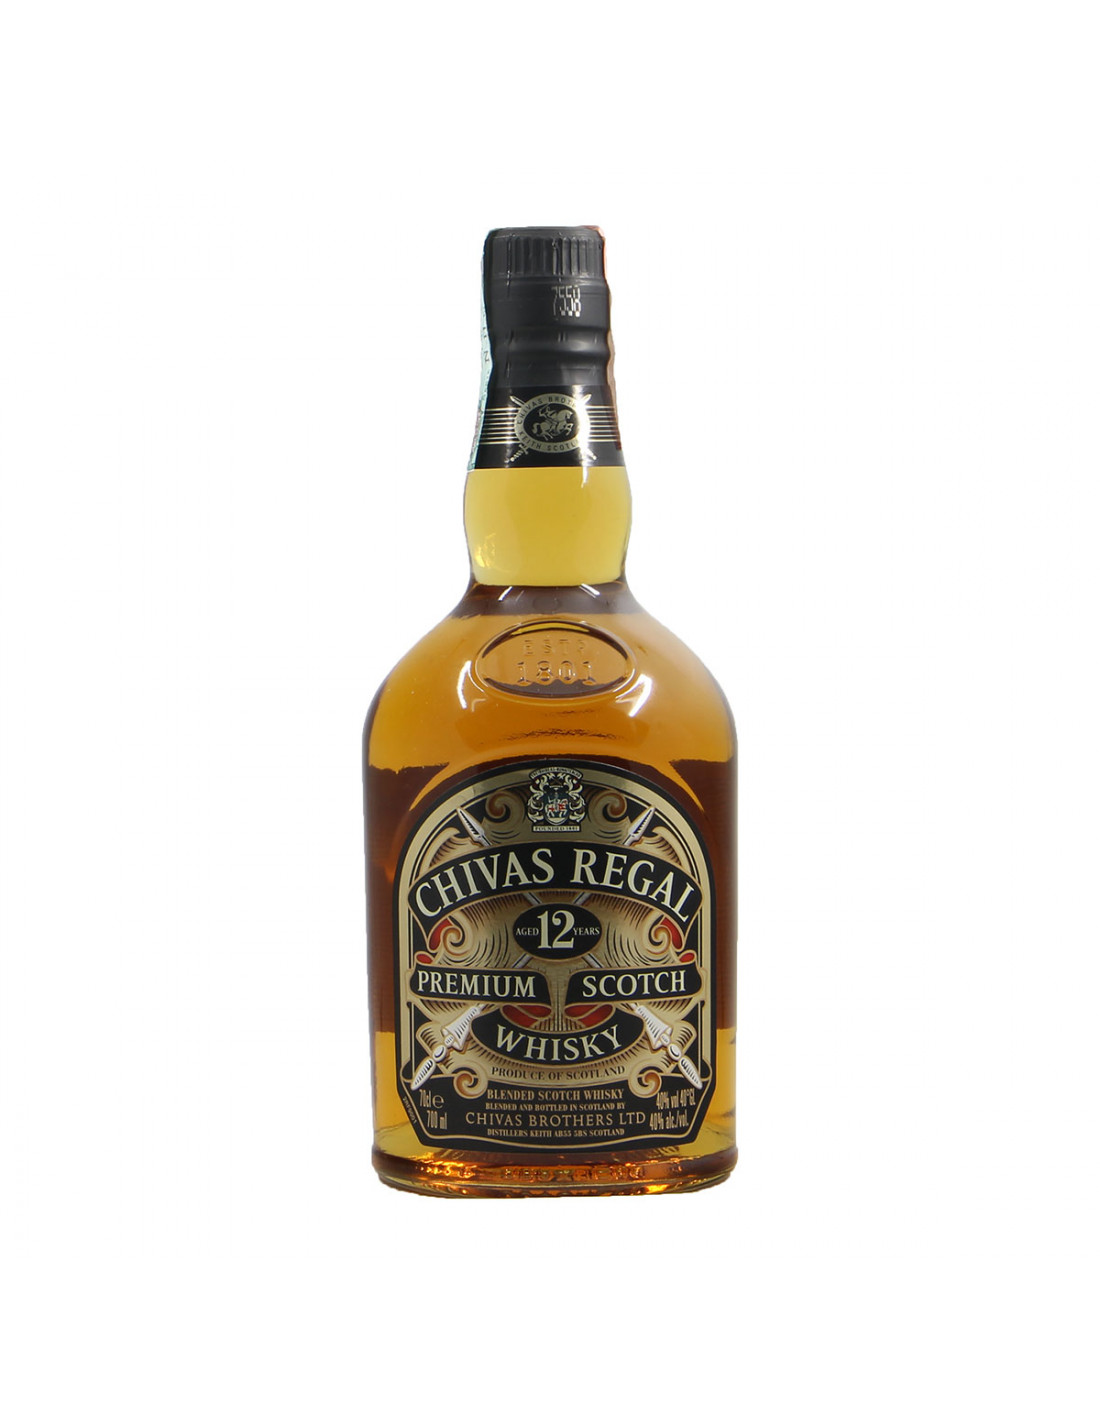 Chivas Regal Aged 12 years Premium Scotch Whisky Grandi Bottiglie